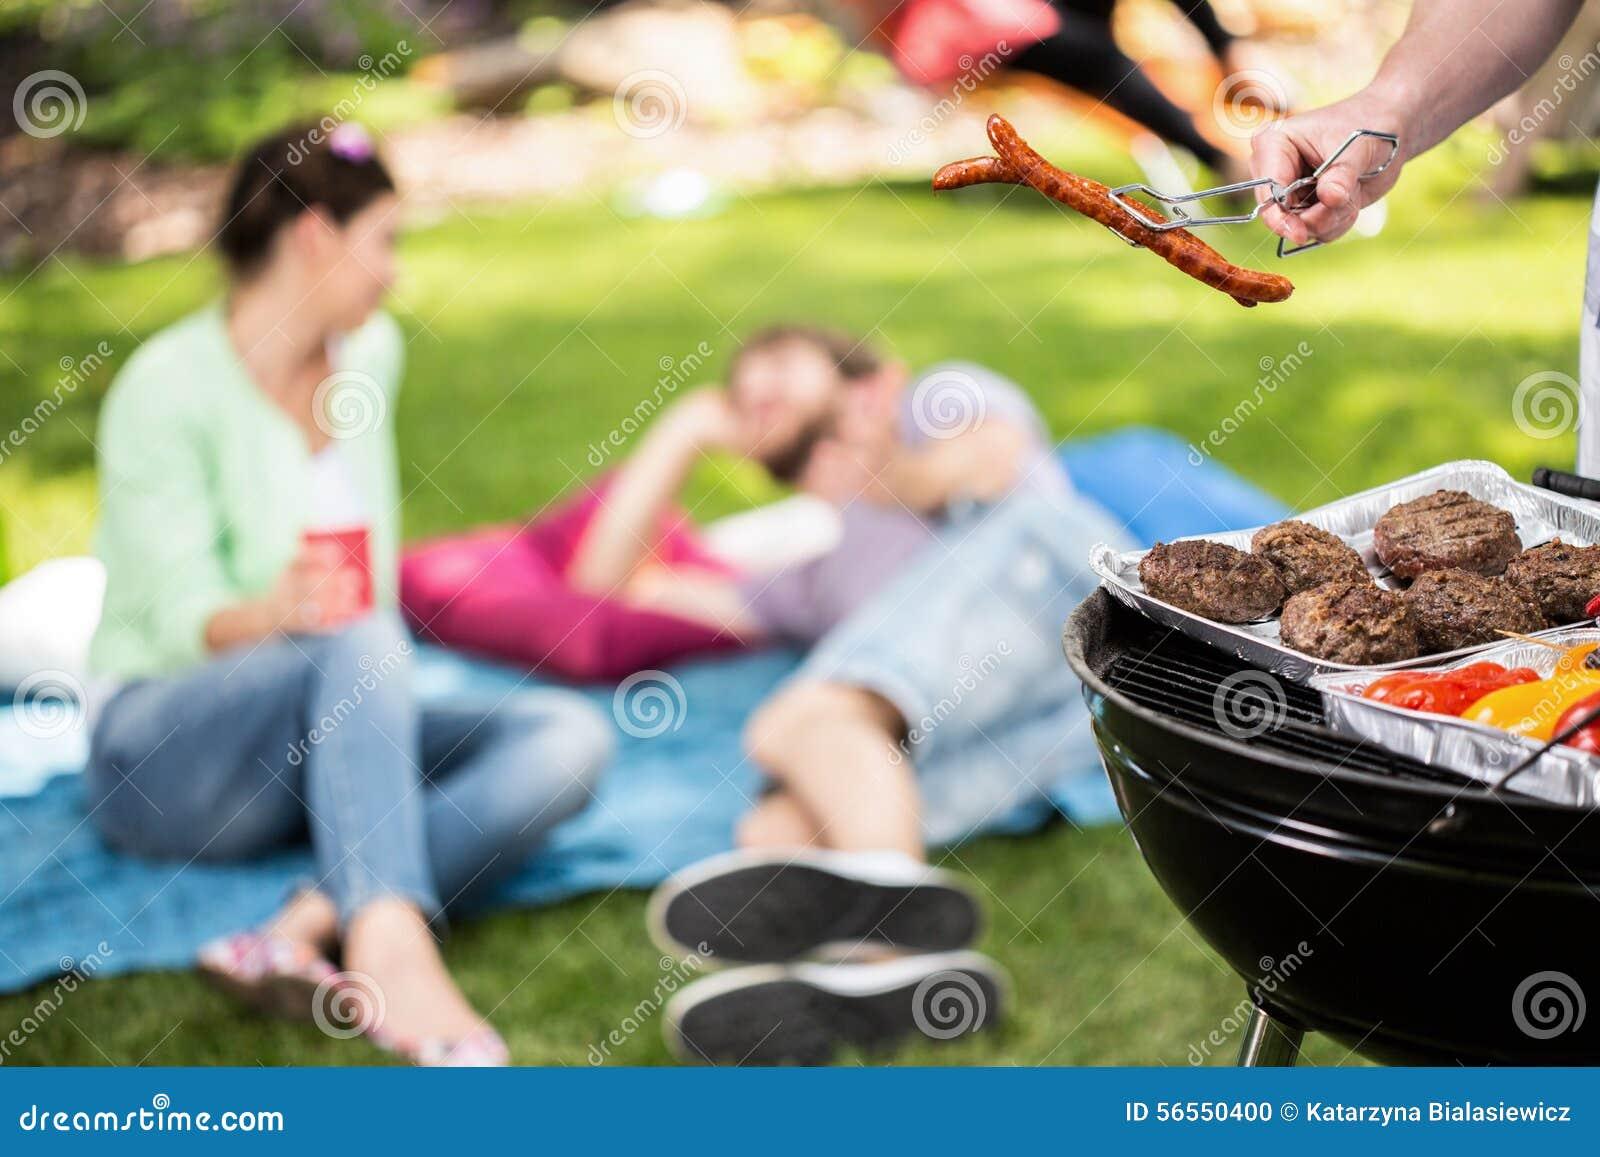 Download Picnic στον κήπο στοκ εικόνες. εικόνα από σχάρα, προετοιμαστείτε - 56550400